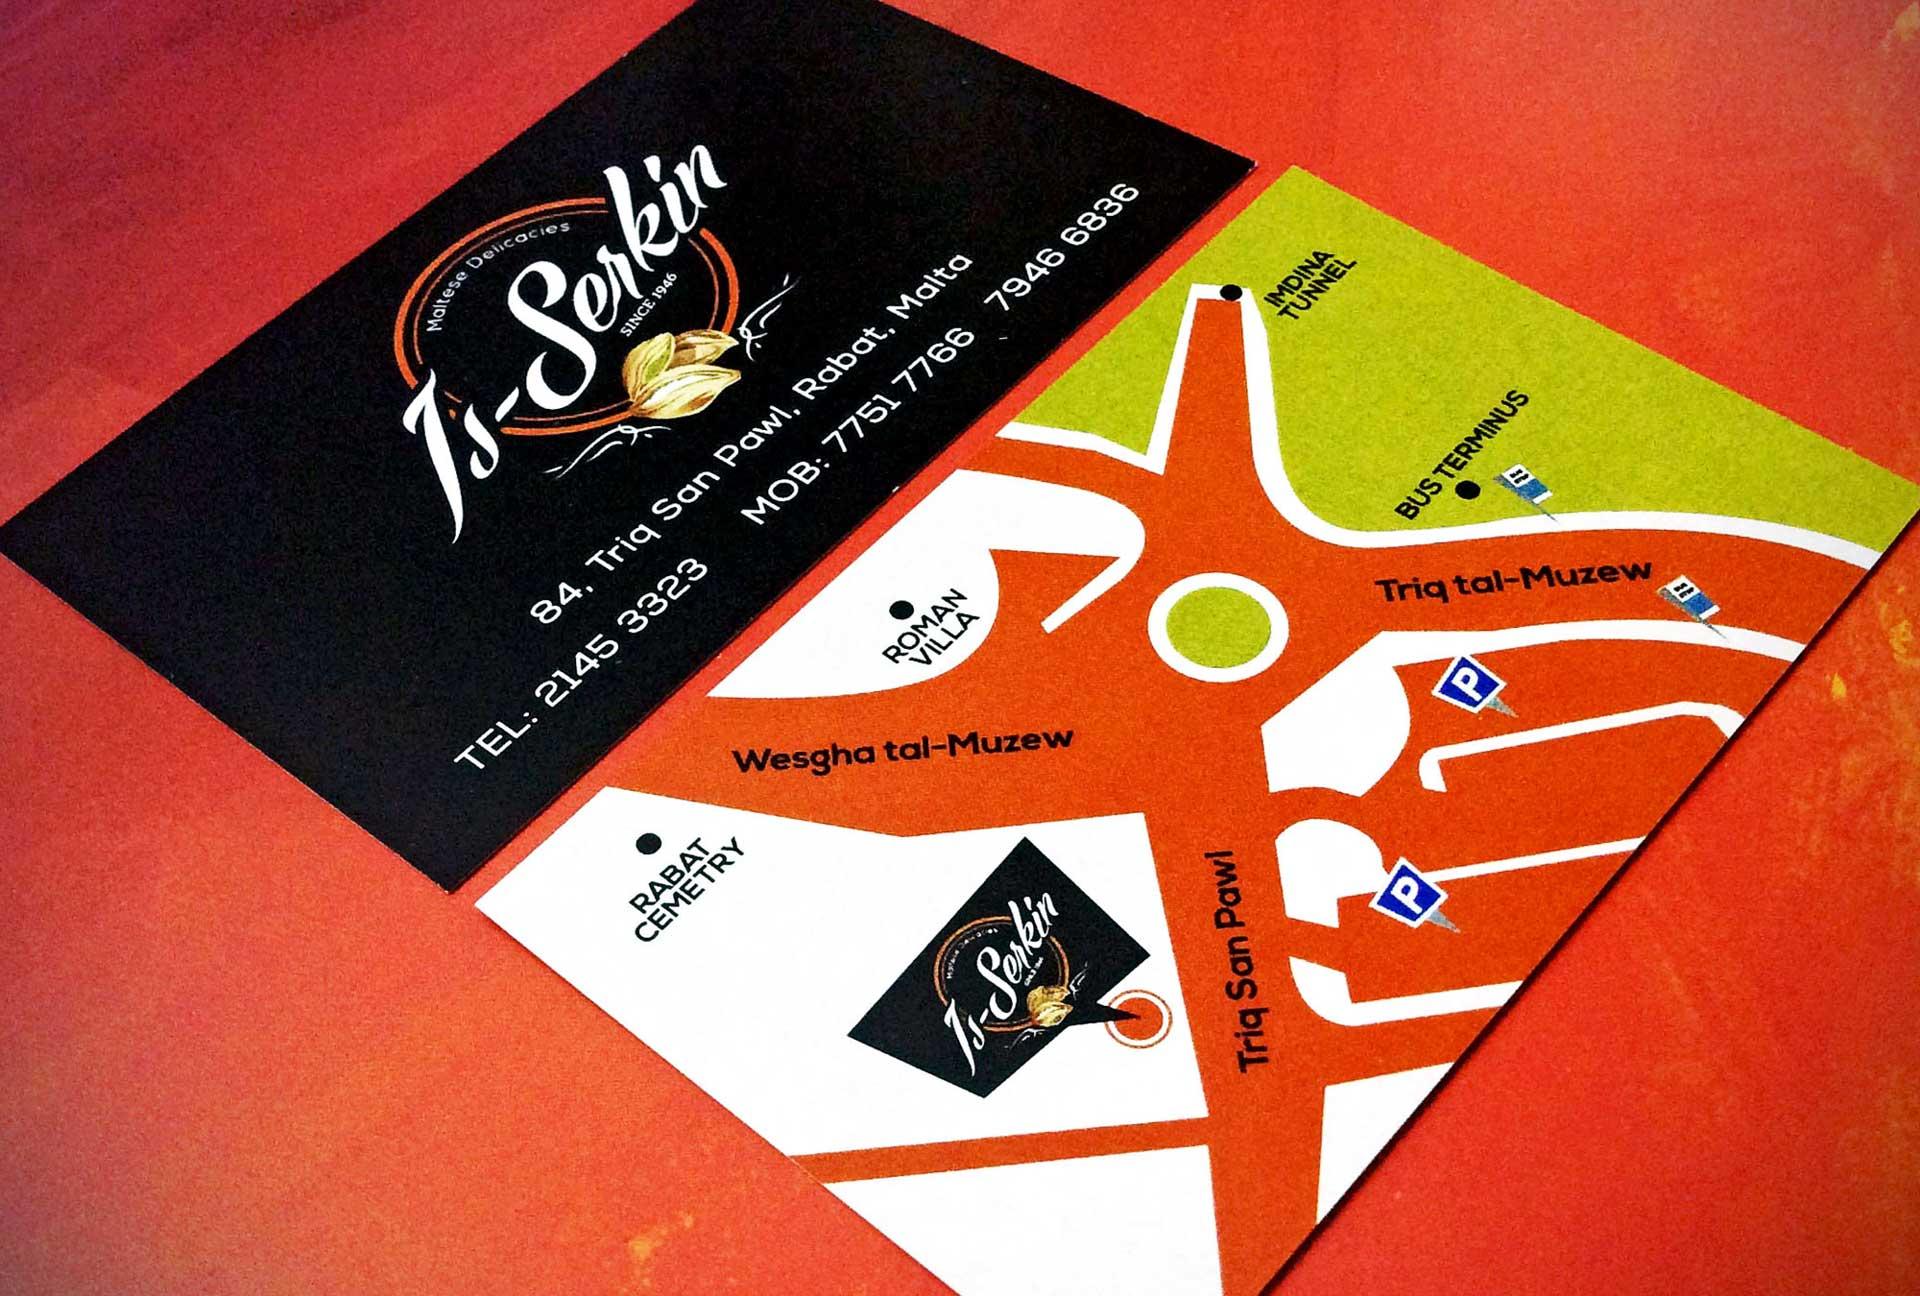 Business Cards - Is-Serkin